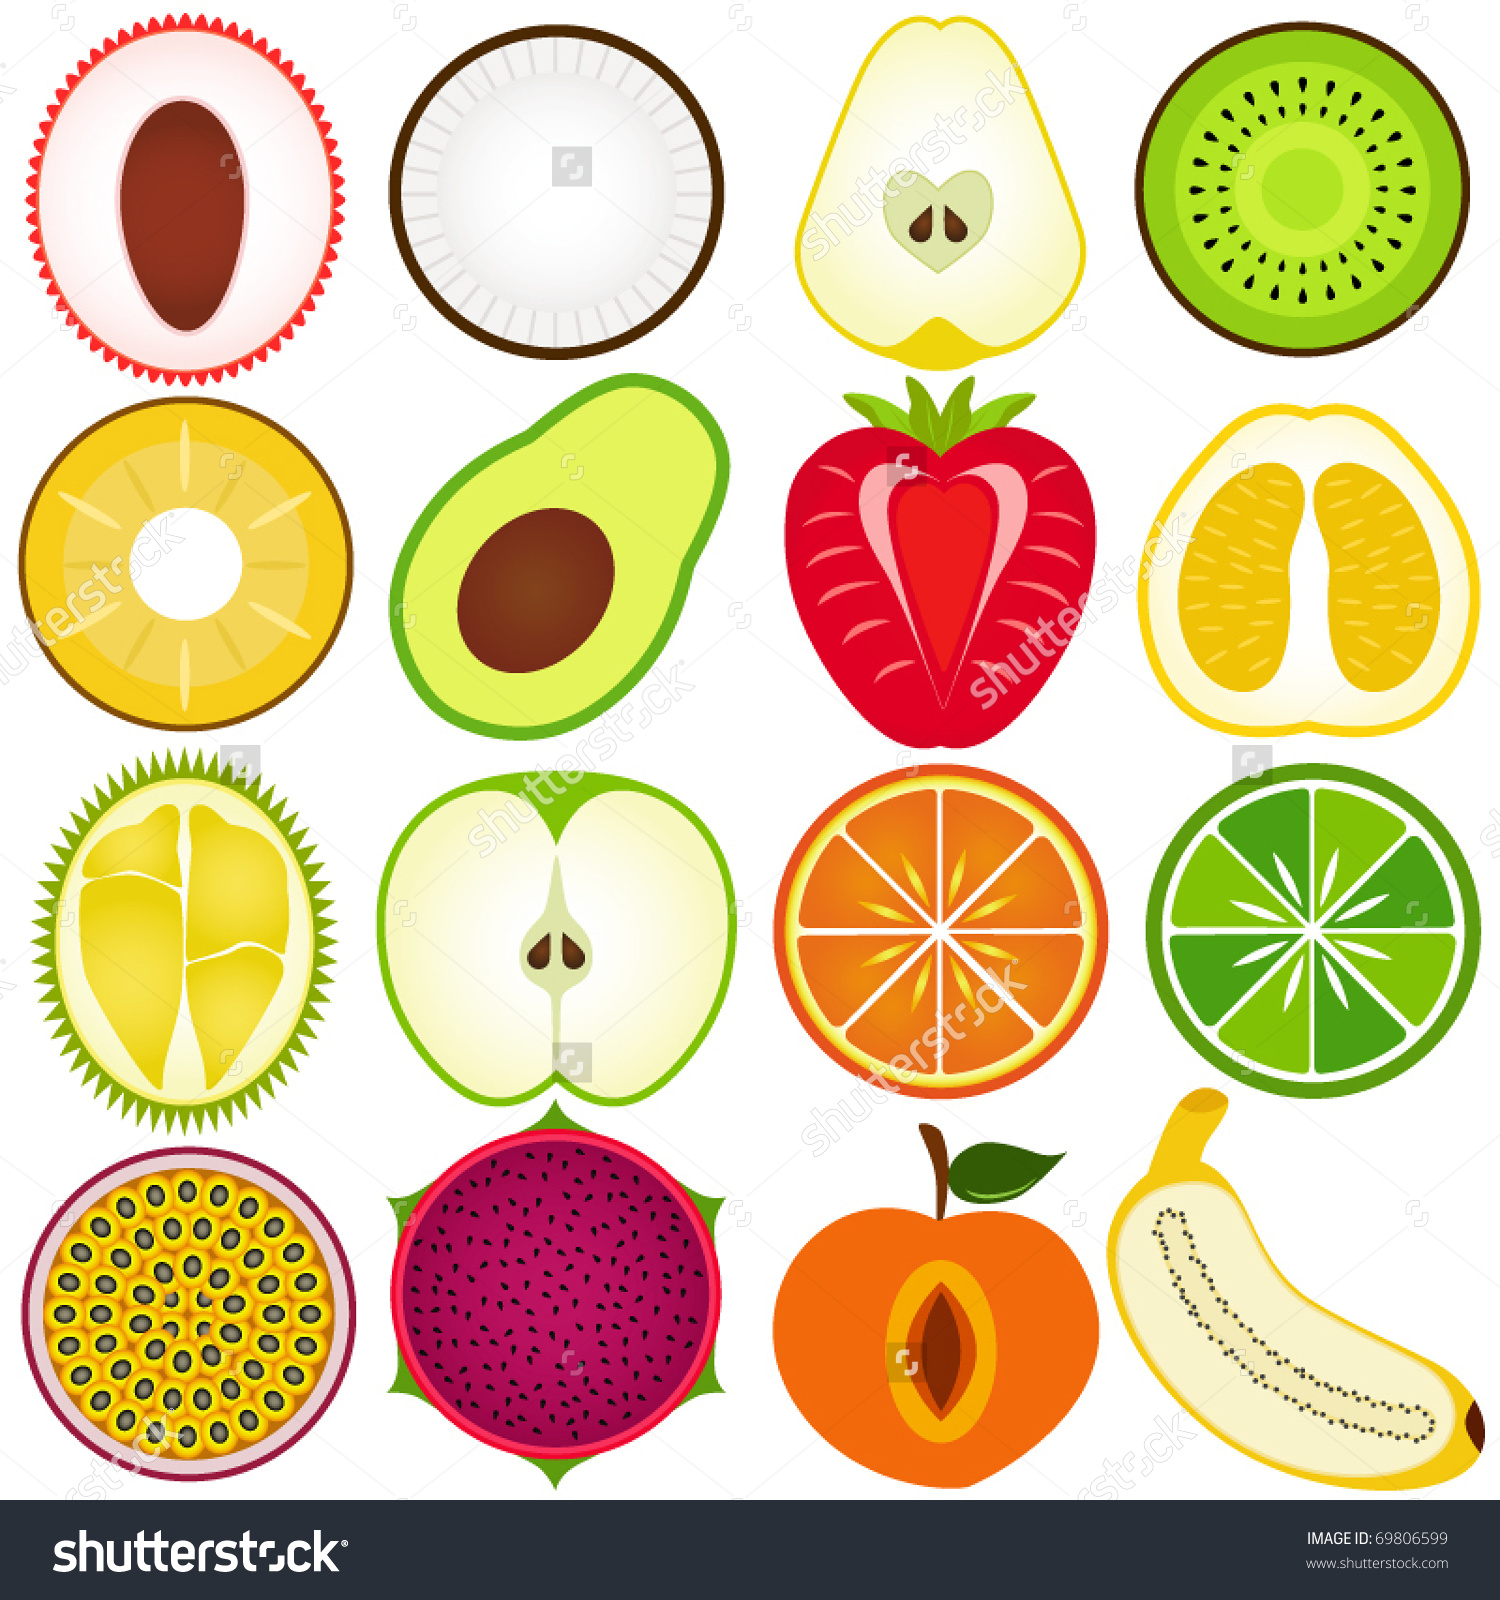 Vector Fresh Fruit Vegetable Cut Half Stock Vector 69806599.